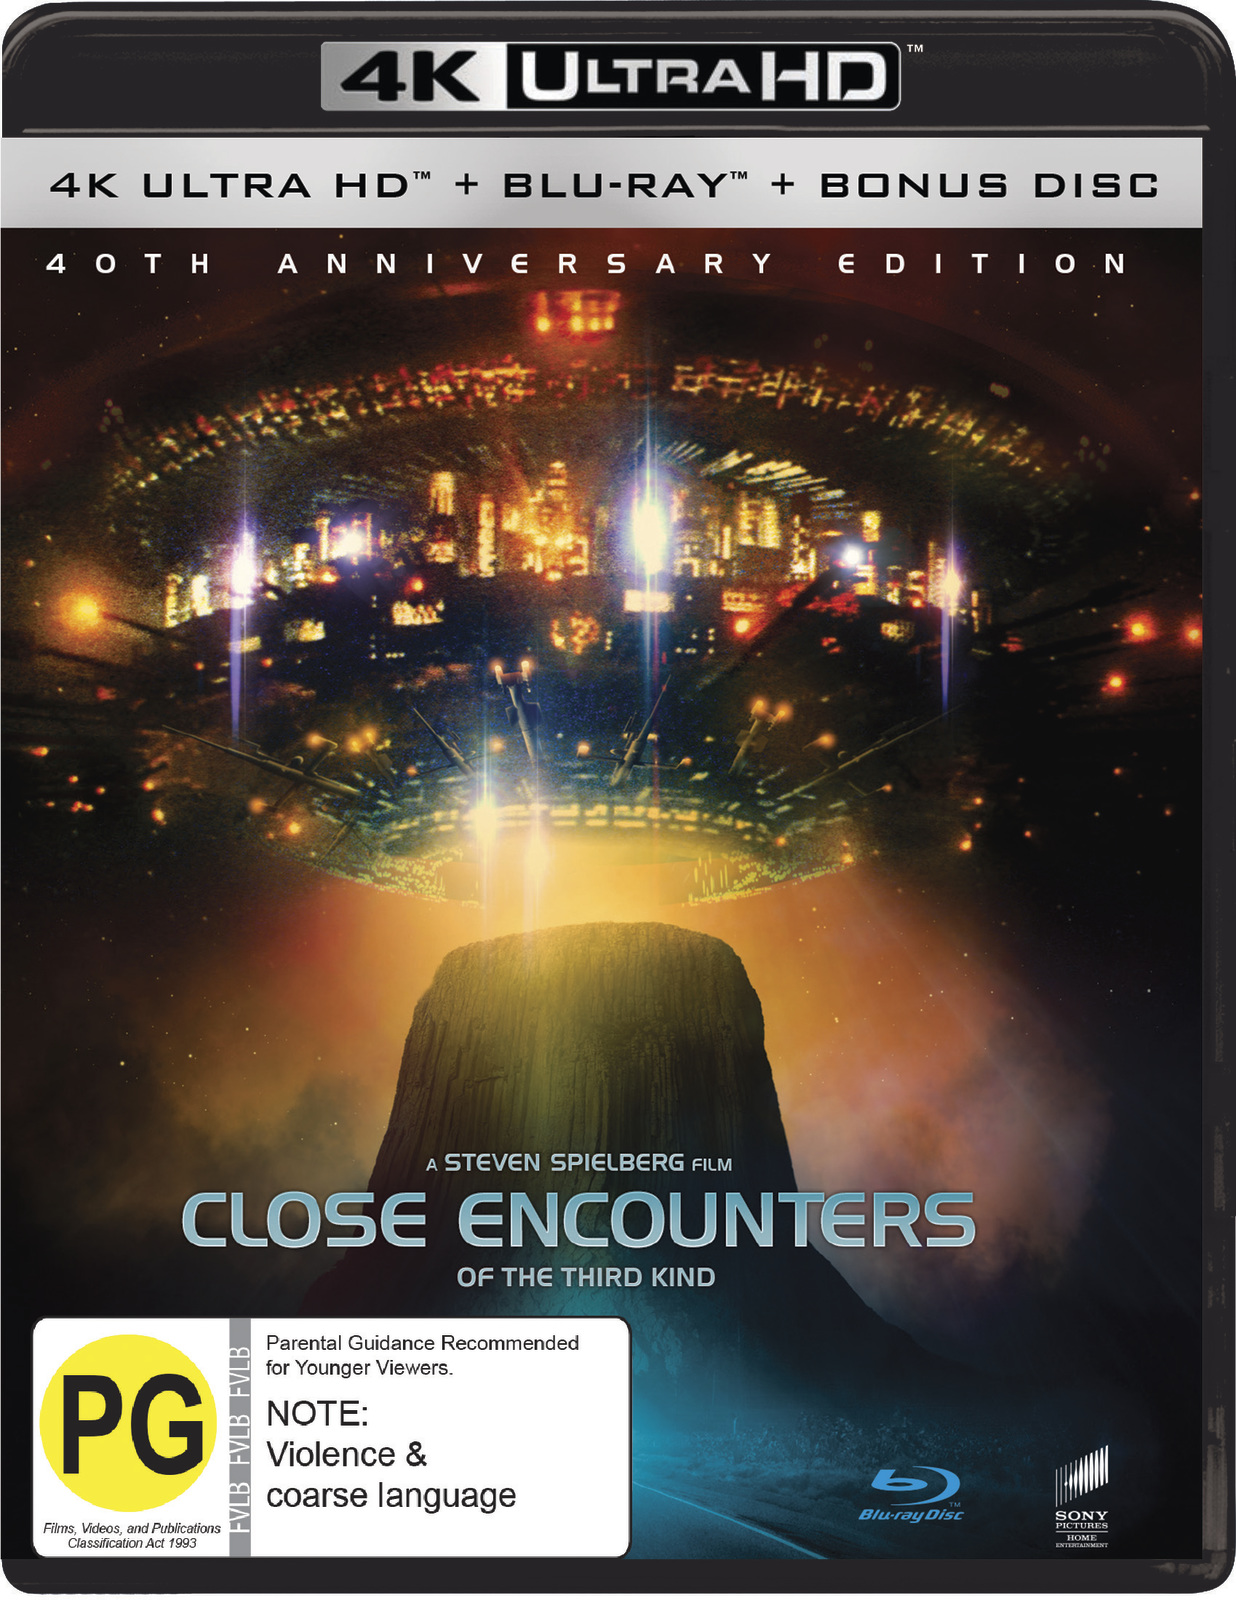 Close Encounters of the Third Kind - 40th Anniversary + Bonus Disc (4K Blu-ray + Blu-ray) on UHD Blu-ray image